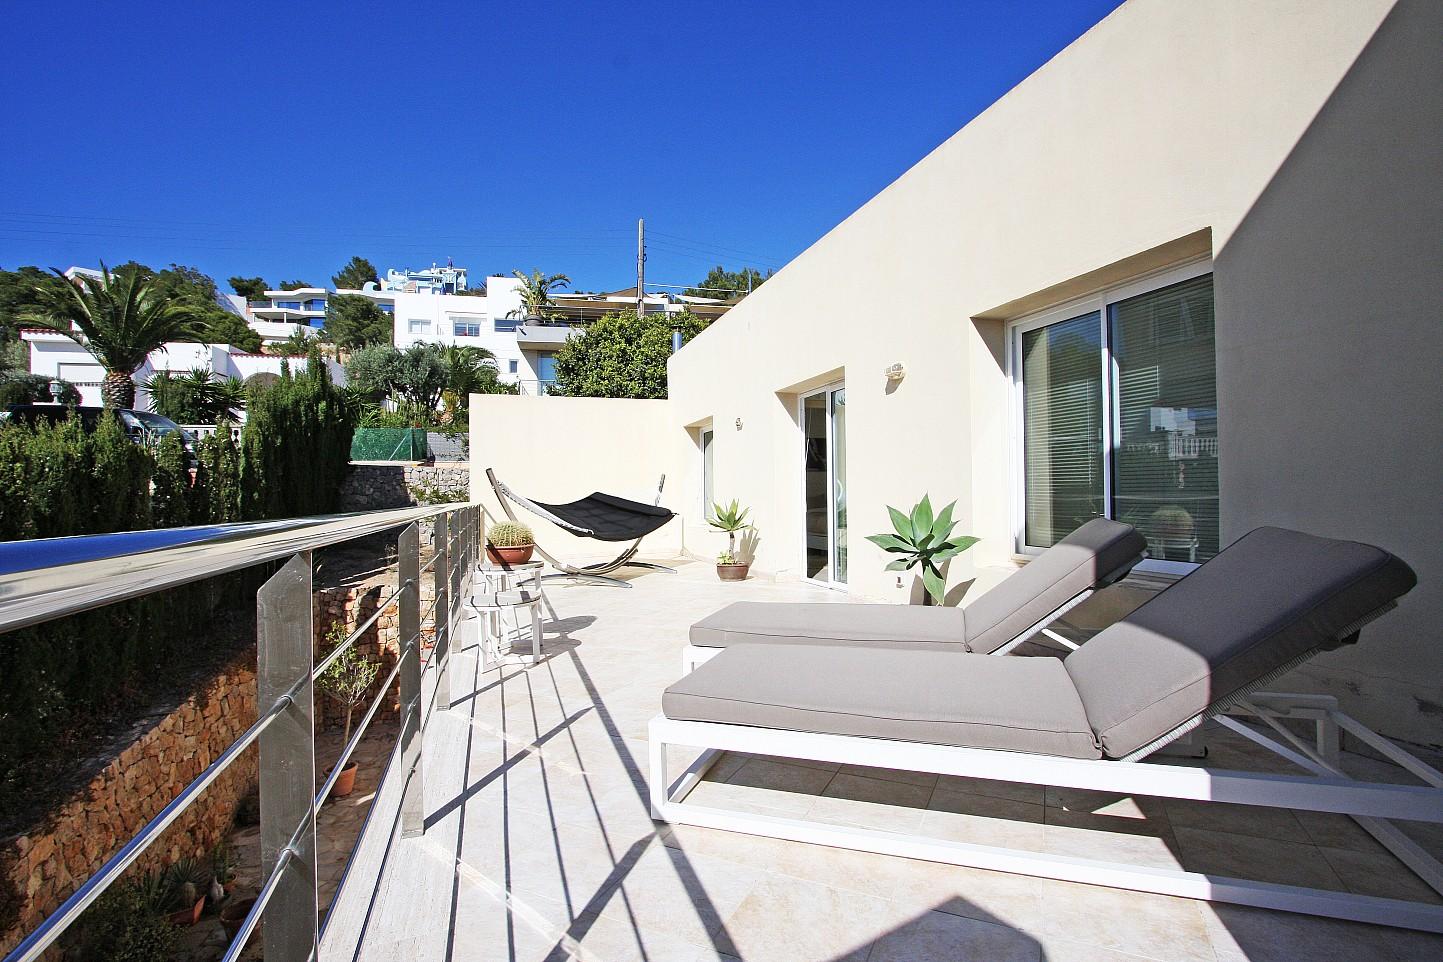 Gran terraza soleada con tumbonas